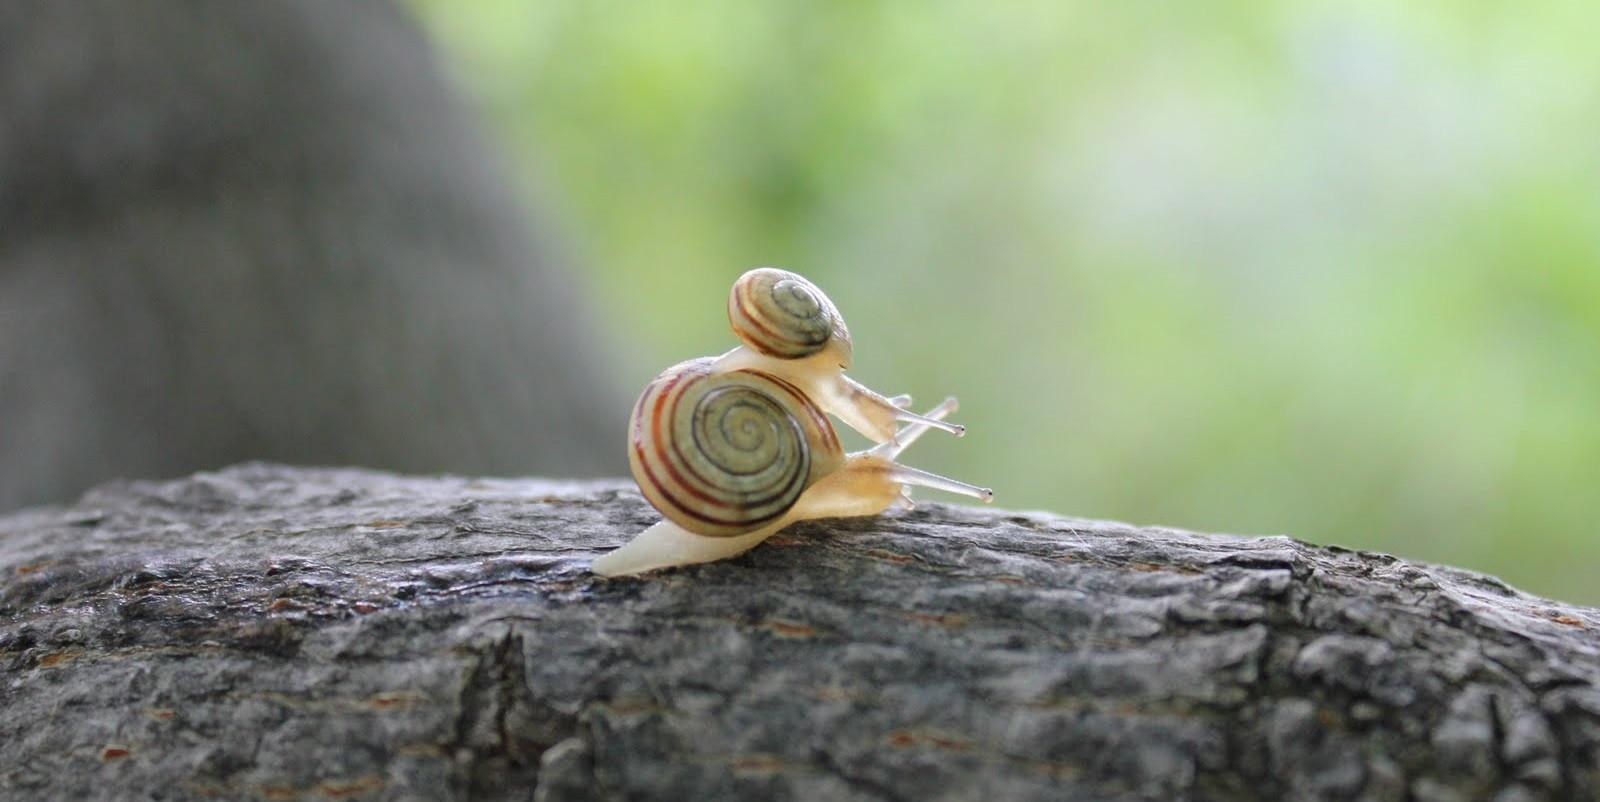 criar caracoles en casa ForComo Criar Caracoles De Jardin